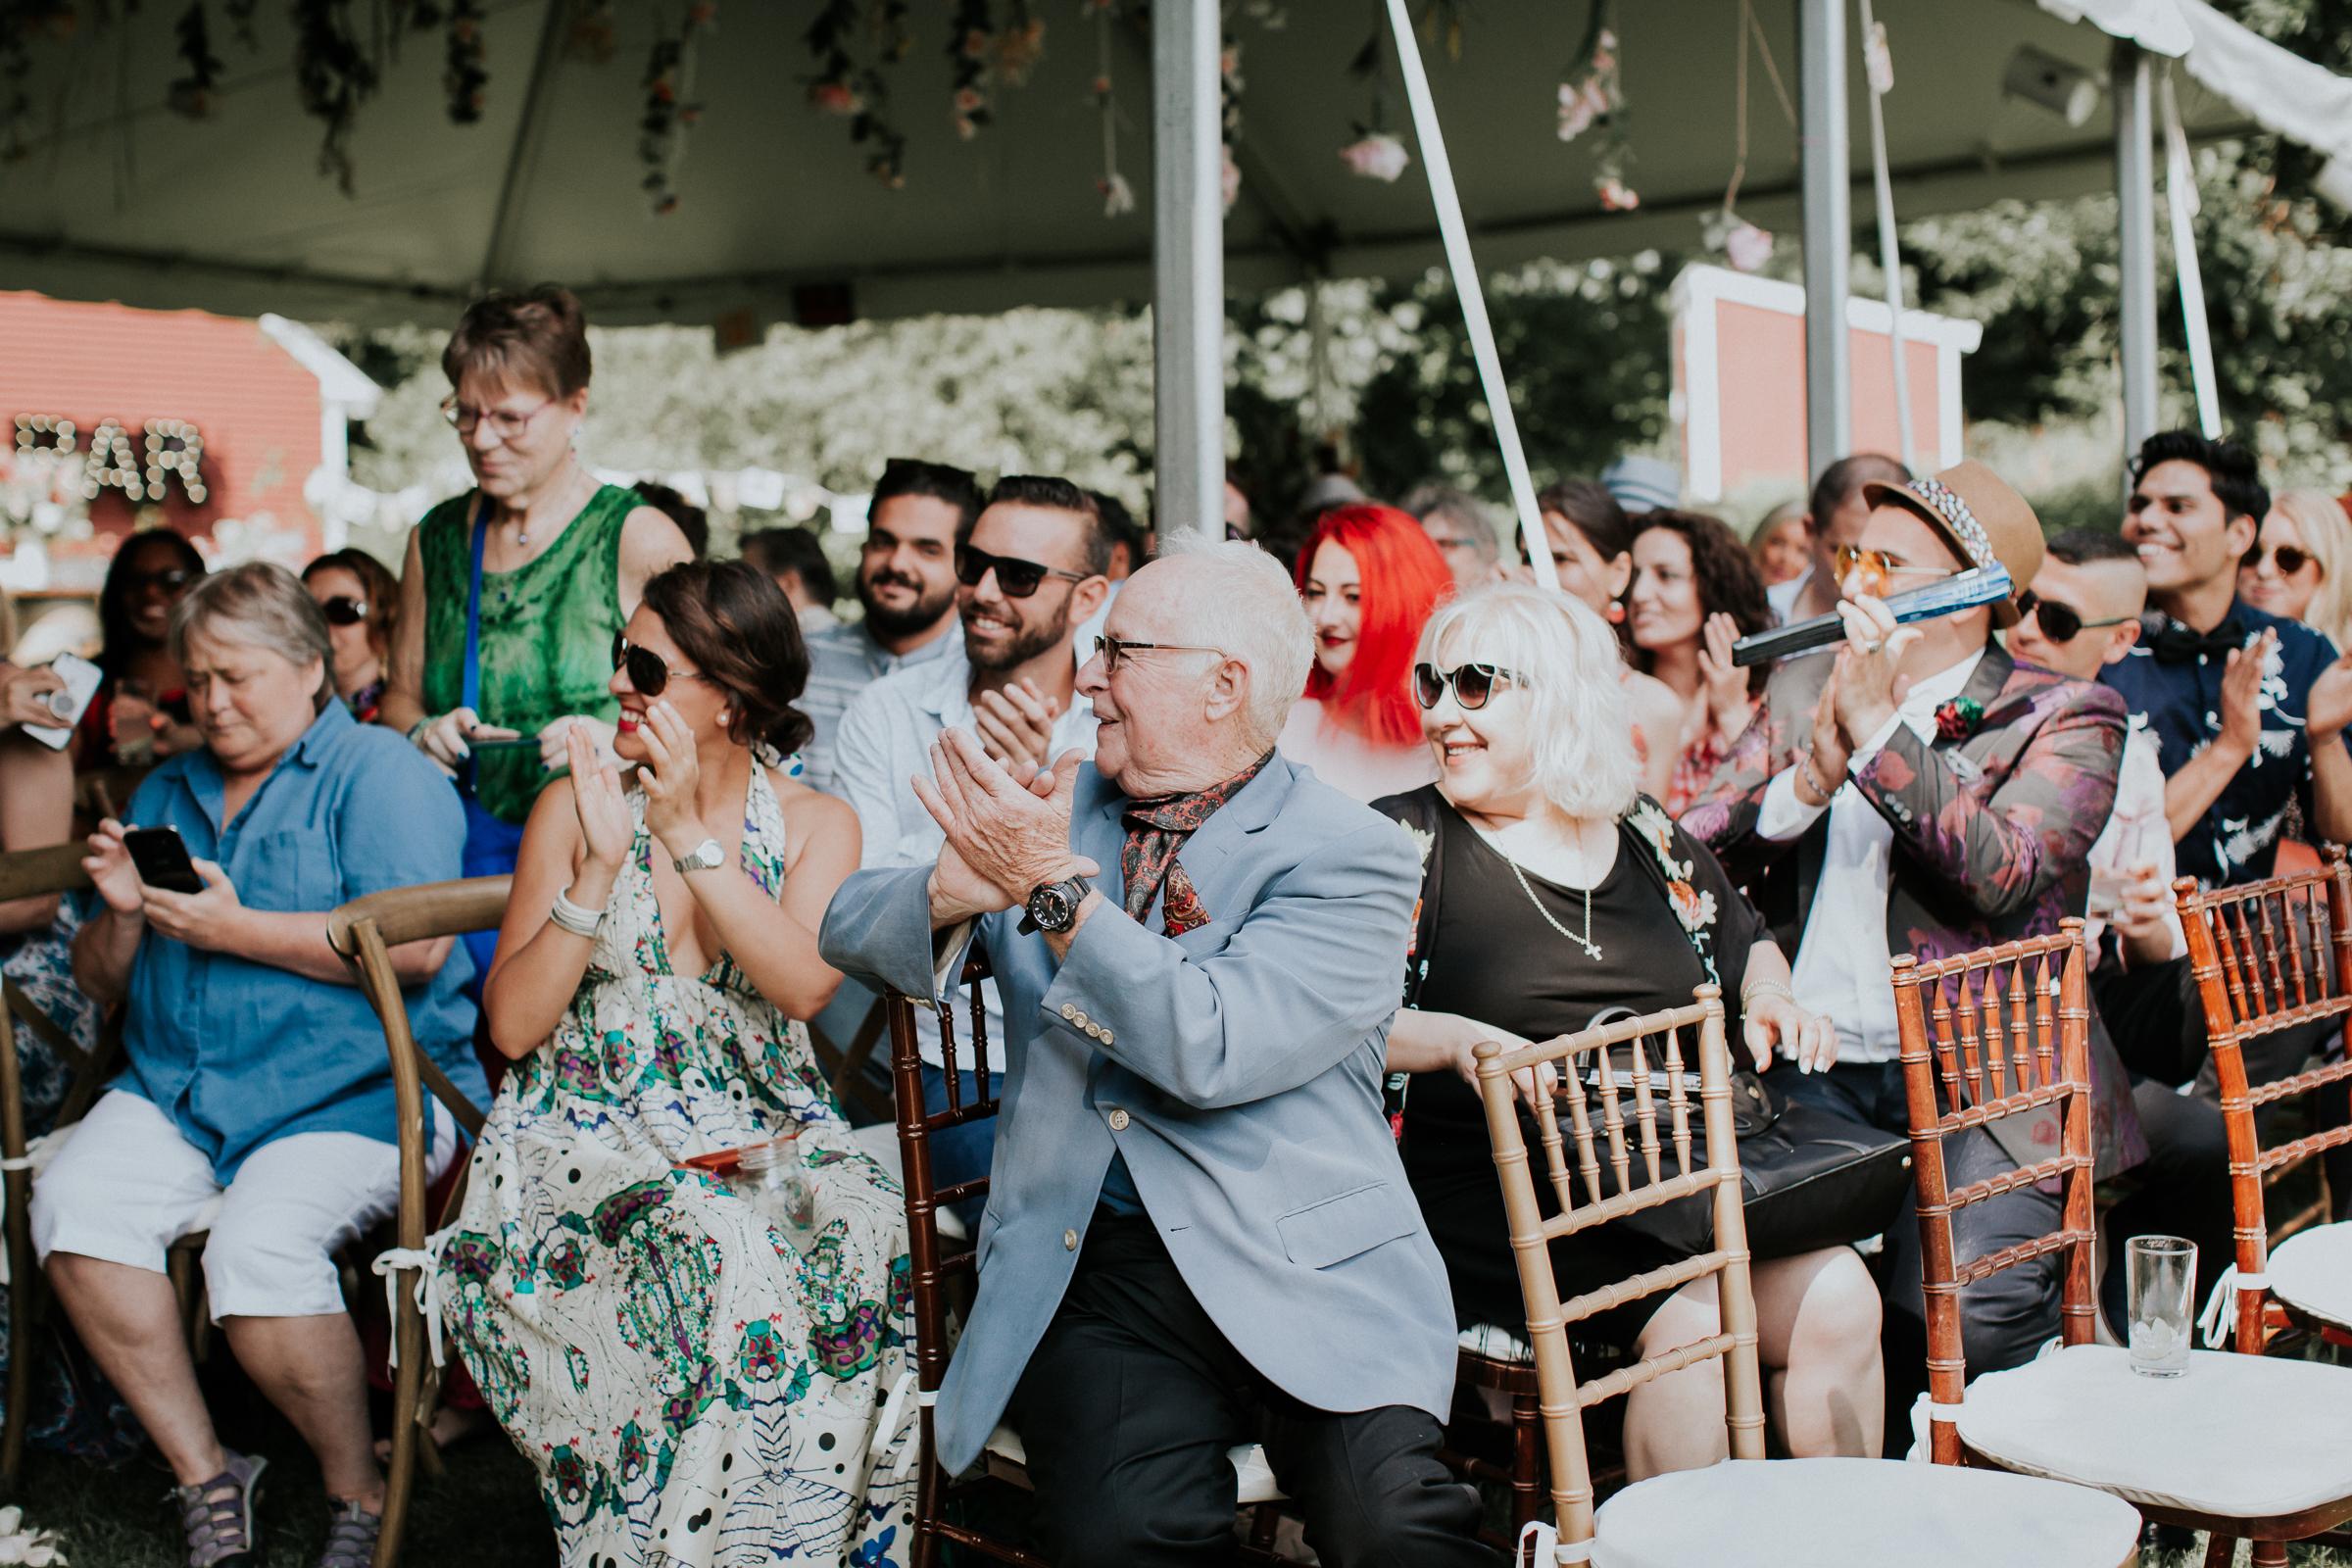 Backyard-Intimate-Adventurous-Destination-Wedding-Darien-Connecticut-Documentary-Wedding-Photography-49.jpg